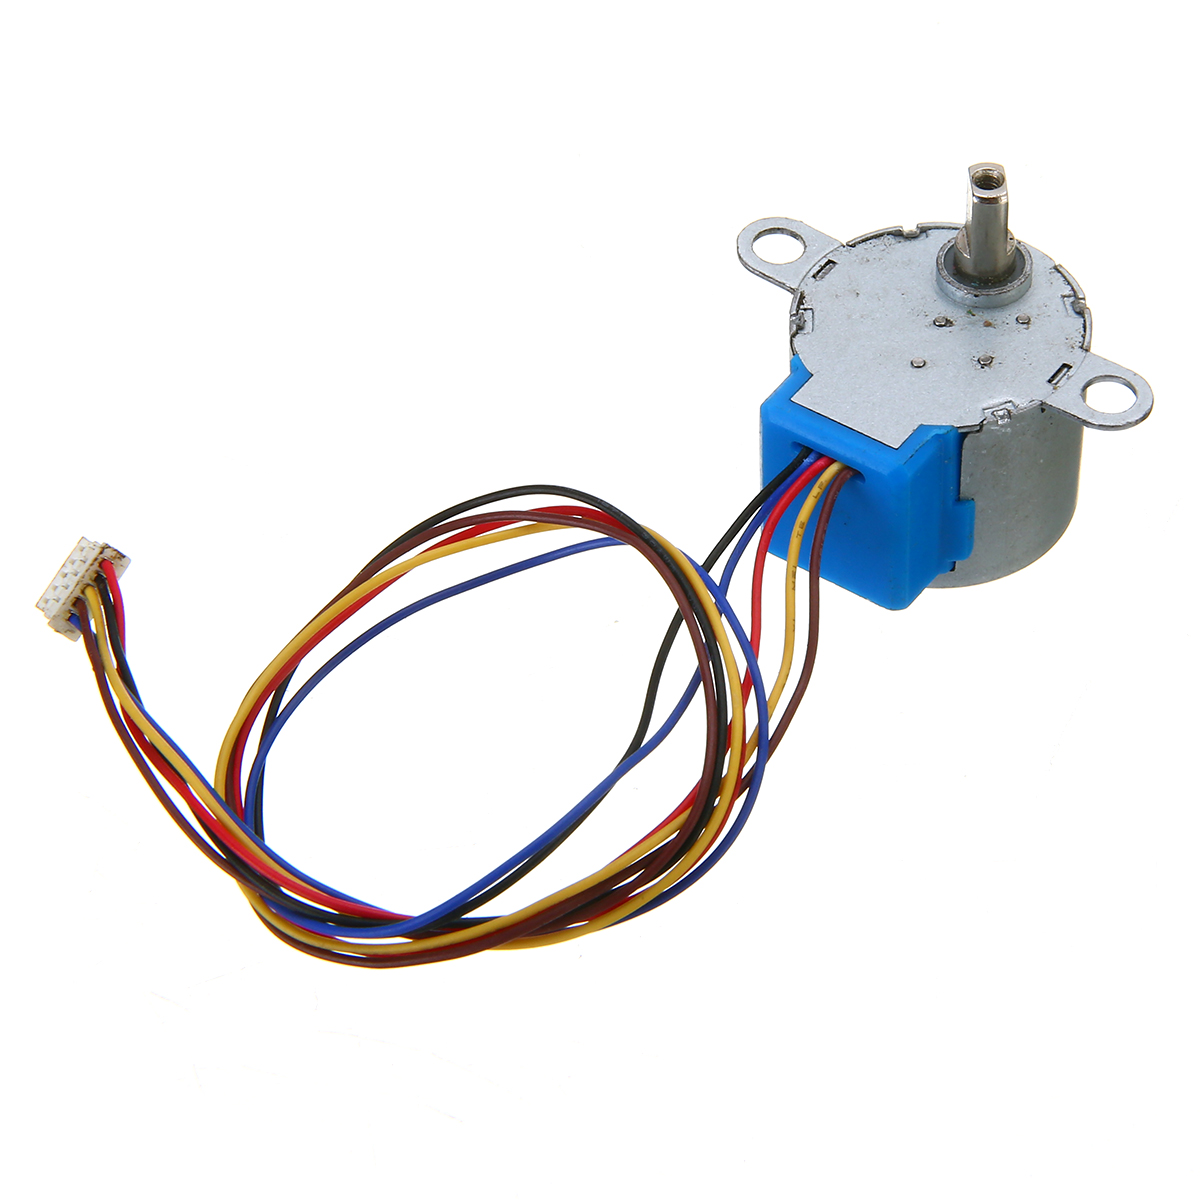 Mayitr 1pcs Smart Electronics 24BYJ48 5V 4 Phase 5 Wire DC Gear Stepper Motor for arduino DIY Kit